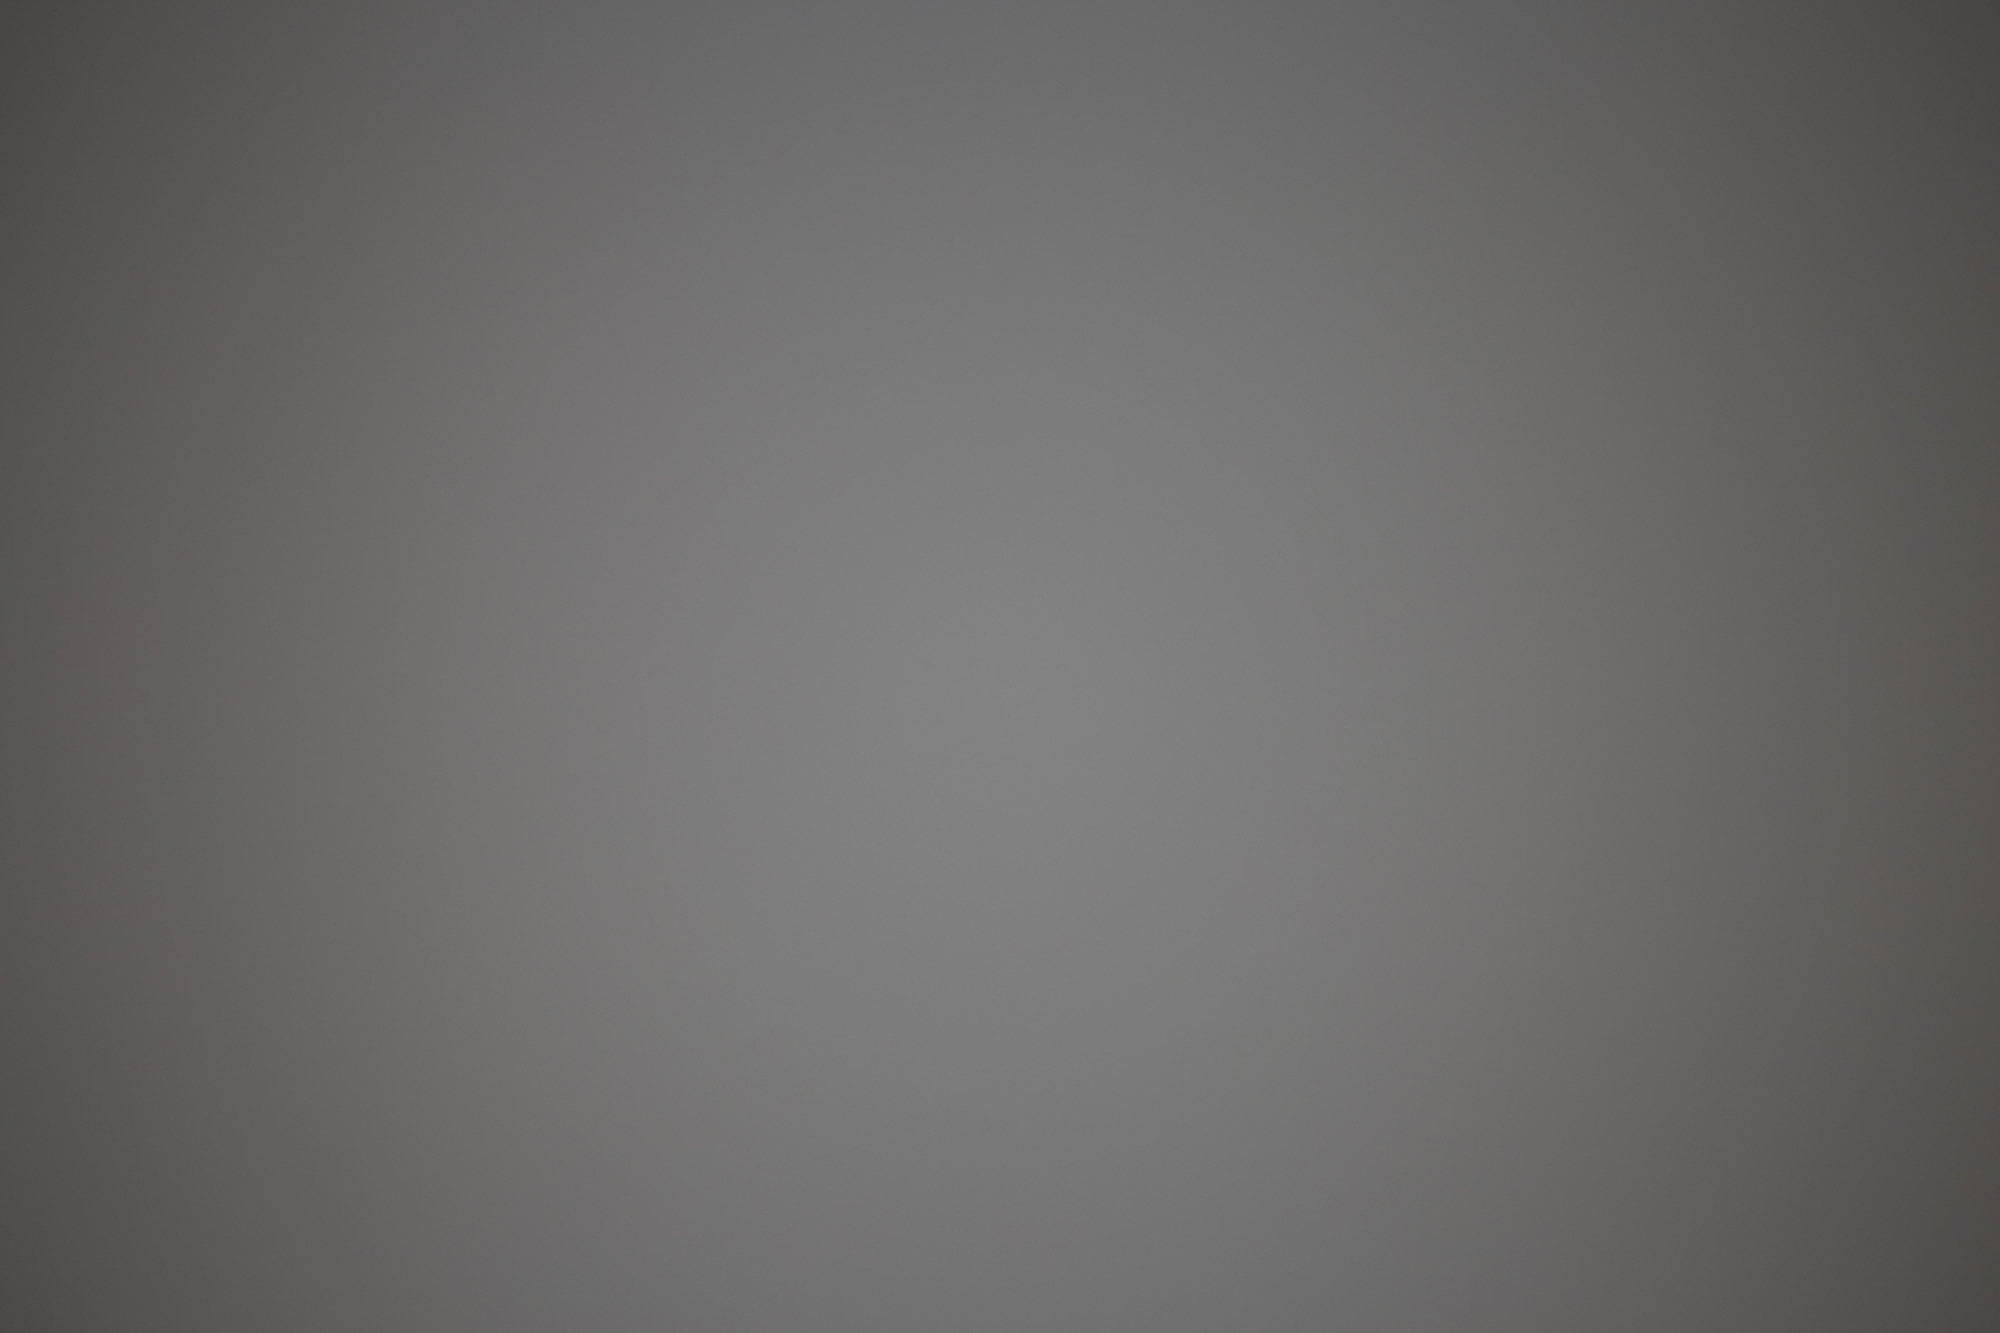 f:id:snct-astro:20210125192224j:plain